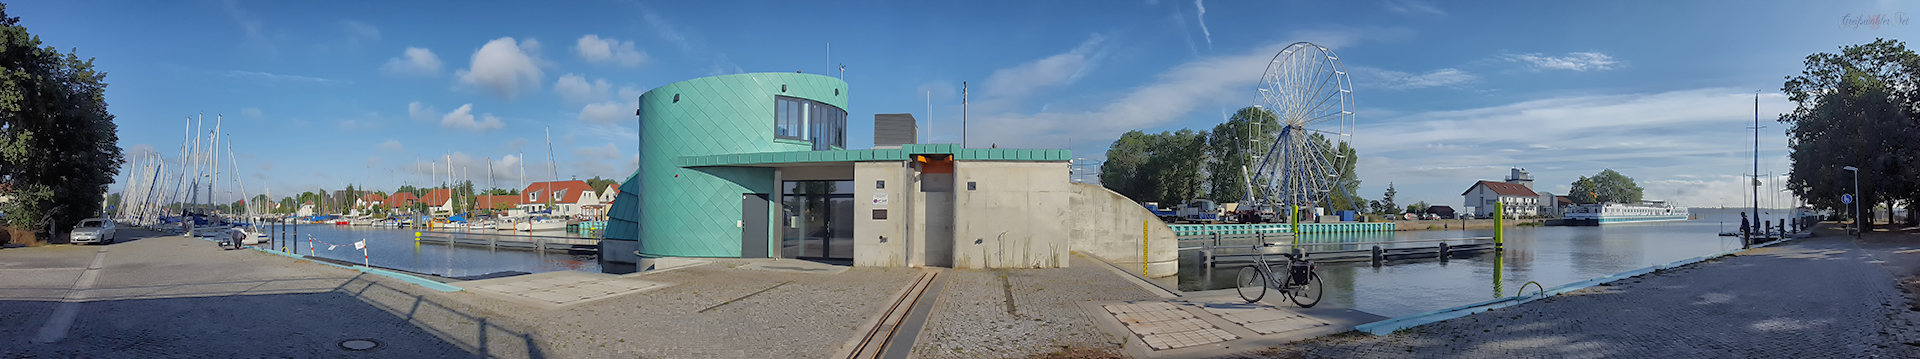 Greifswald-Wieck (Sperrwerk)